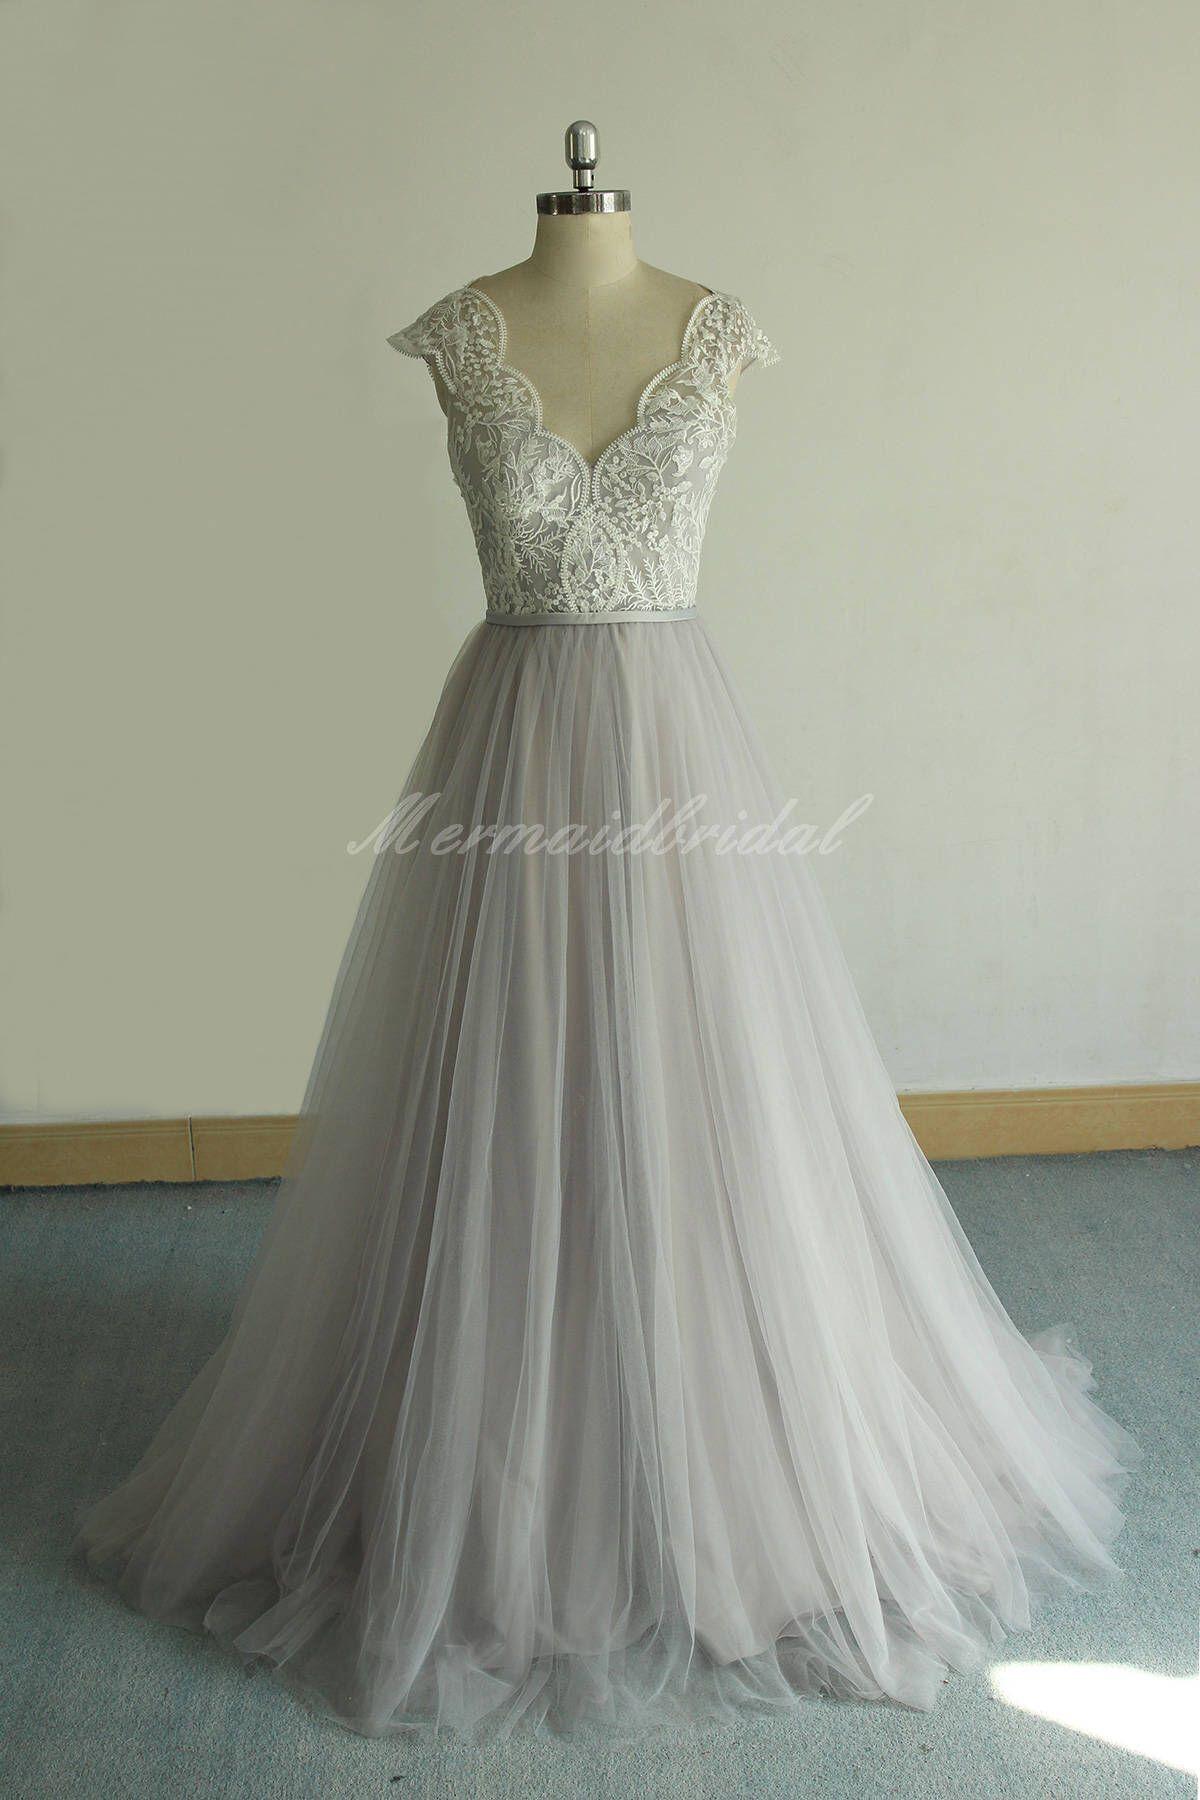 Romantic bohemian wedding dressscallop neckline outdoor wedding